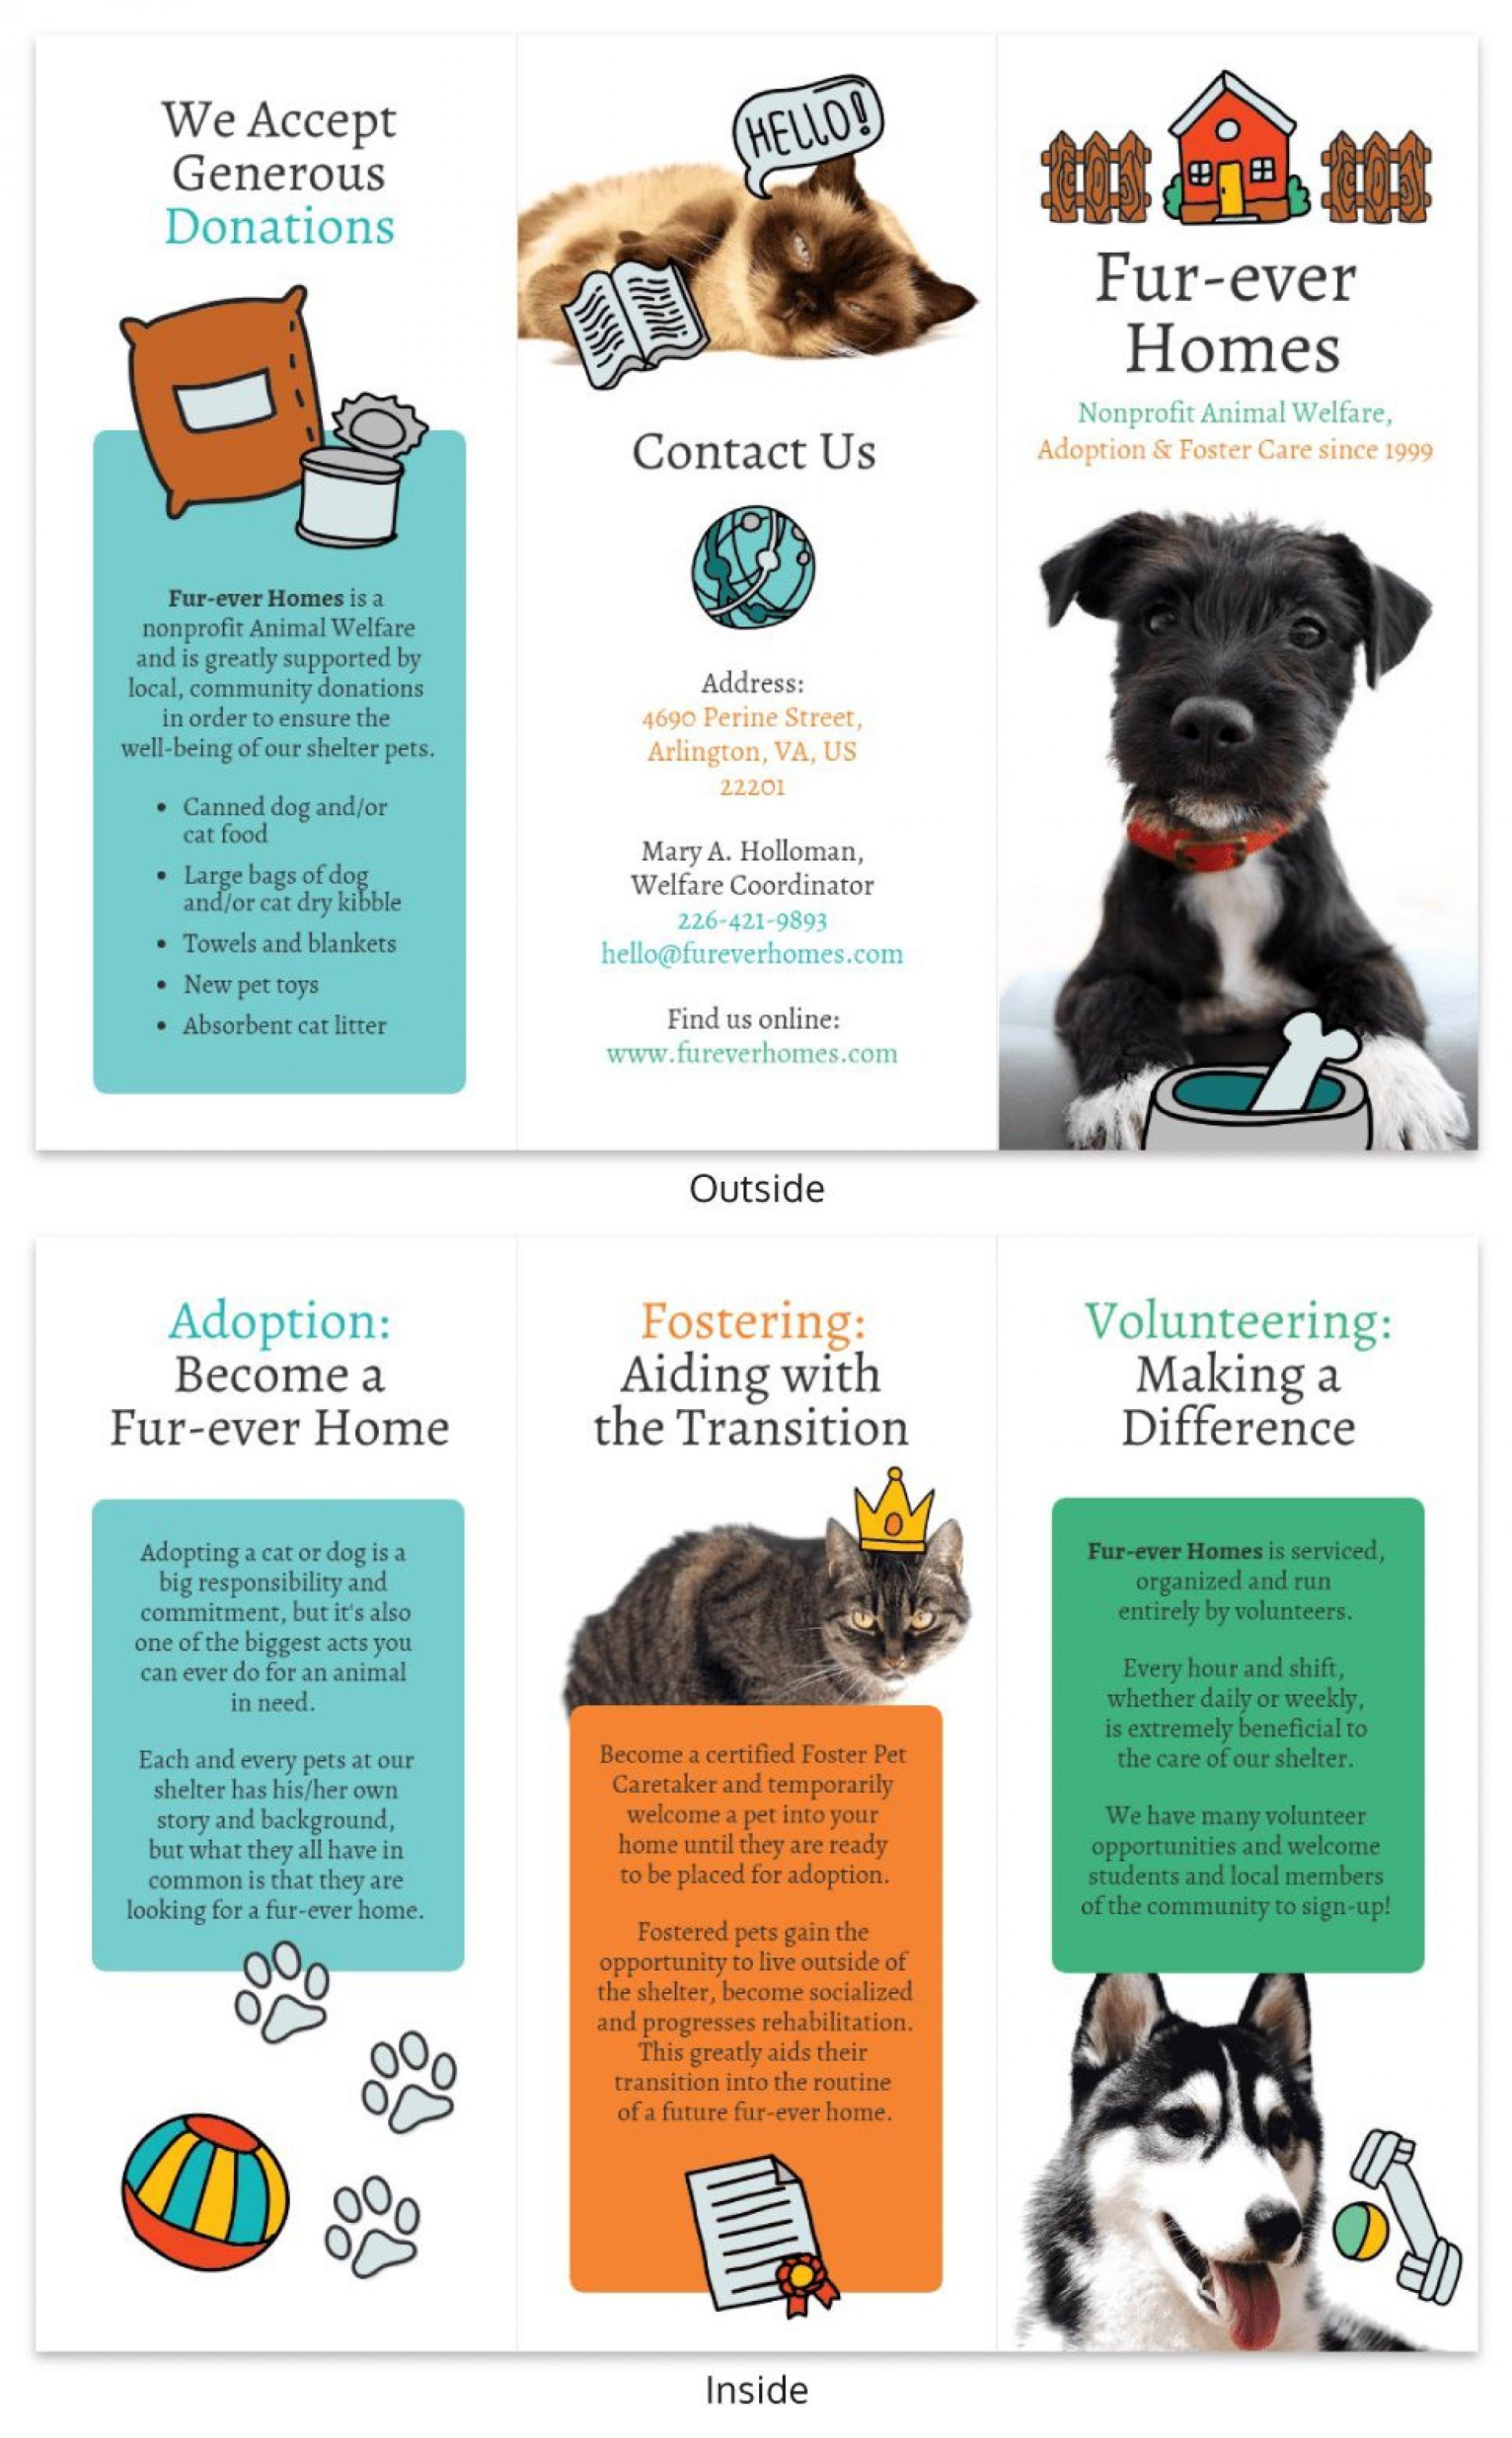 002 Best Pet Adoption Flyer Template Sample  Free Event Dog1920